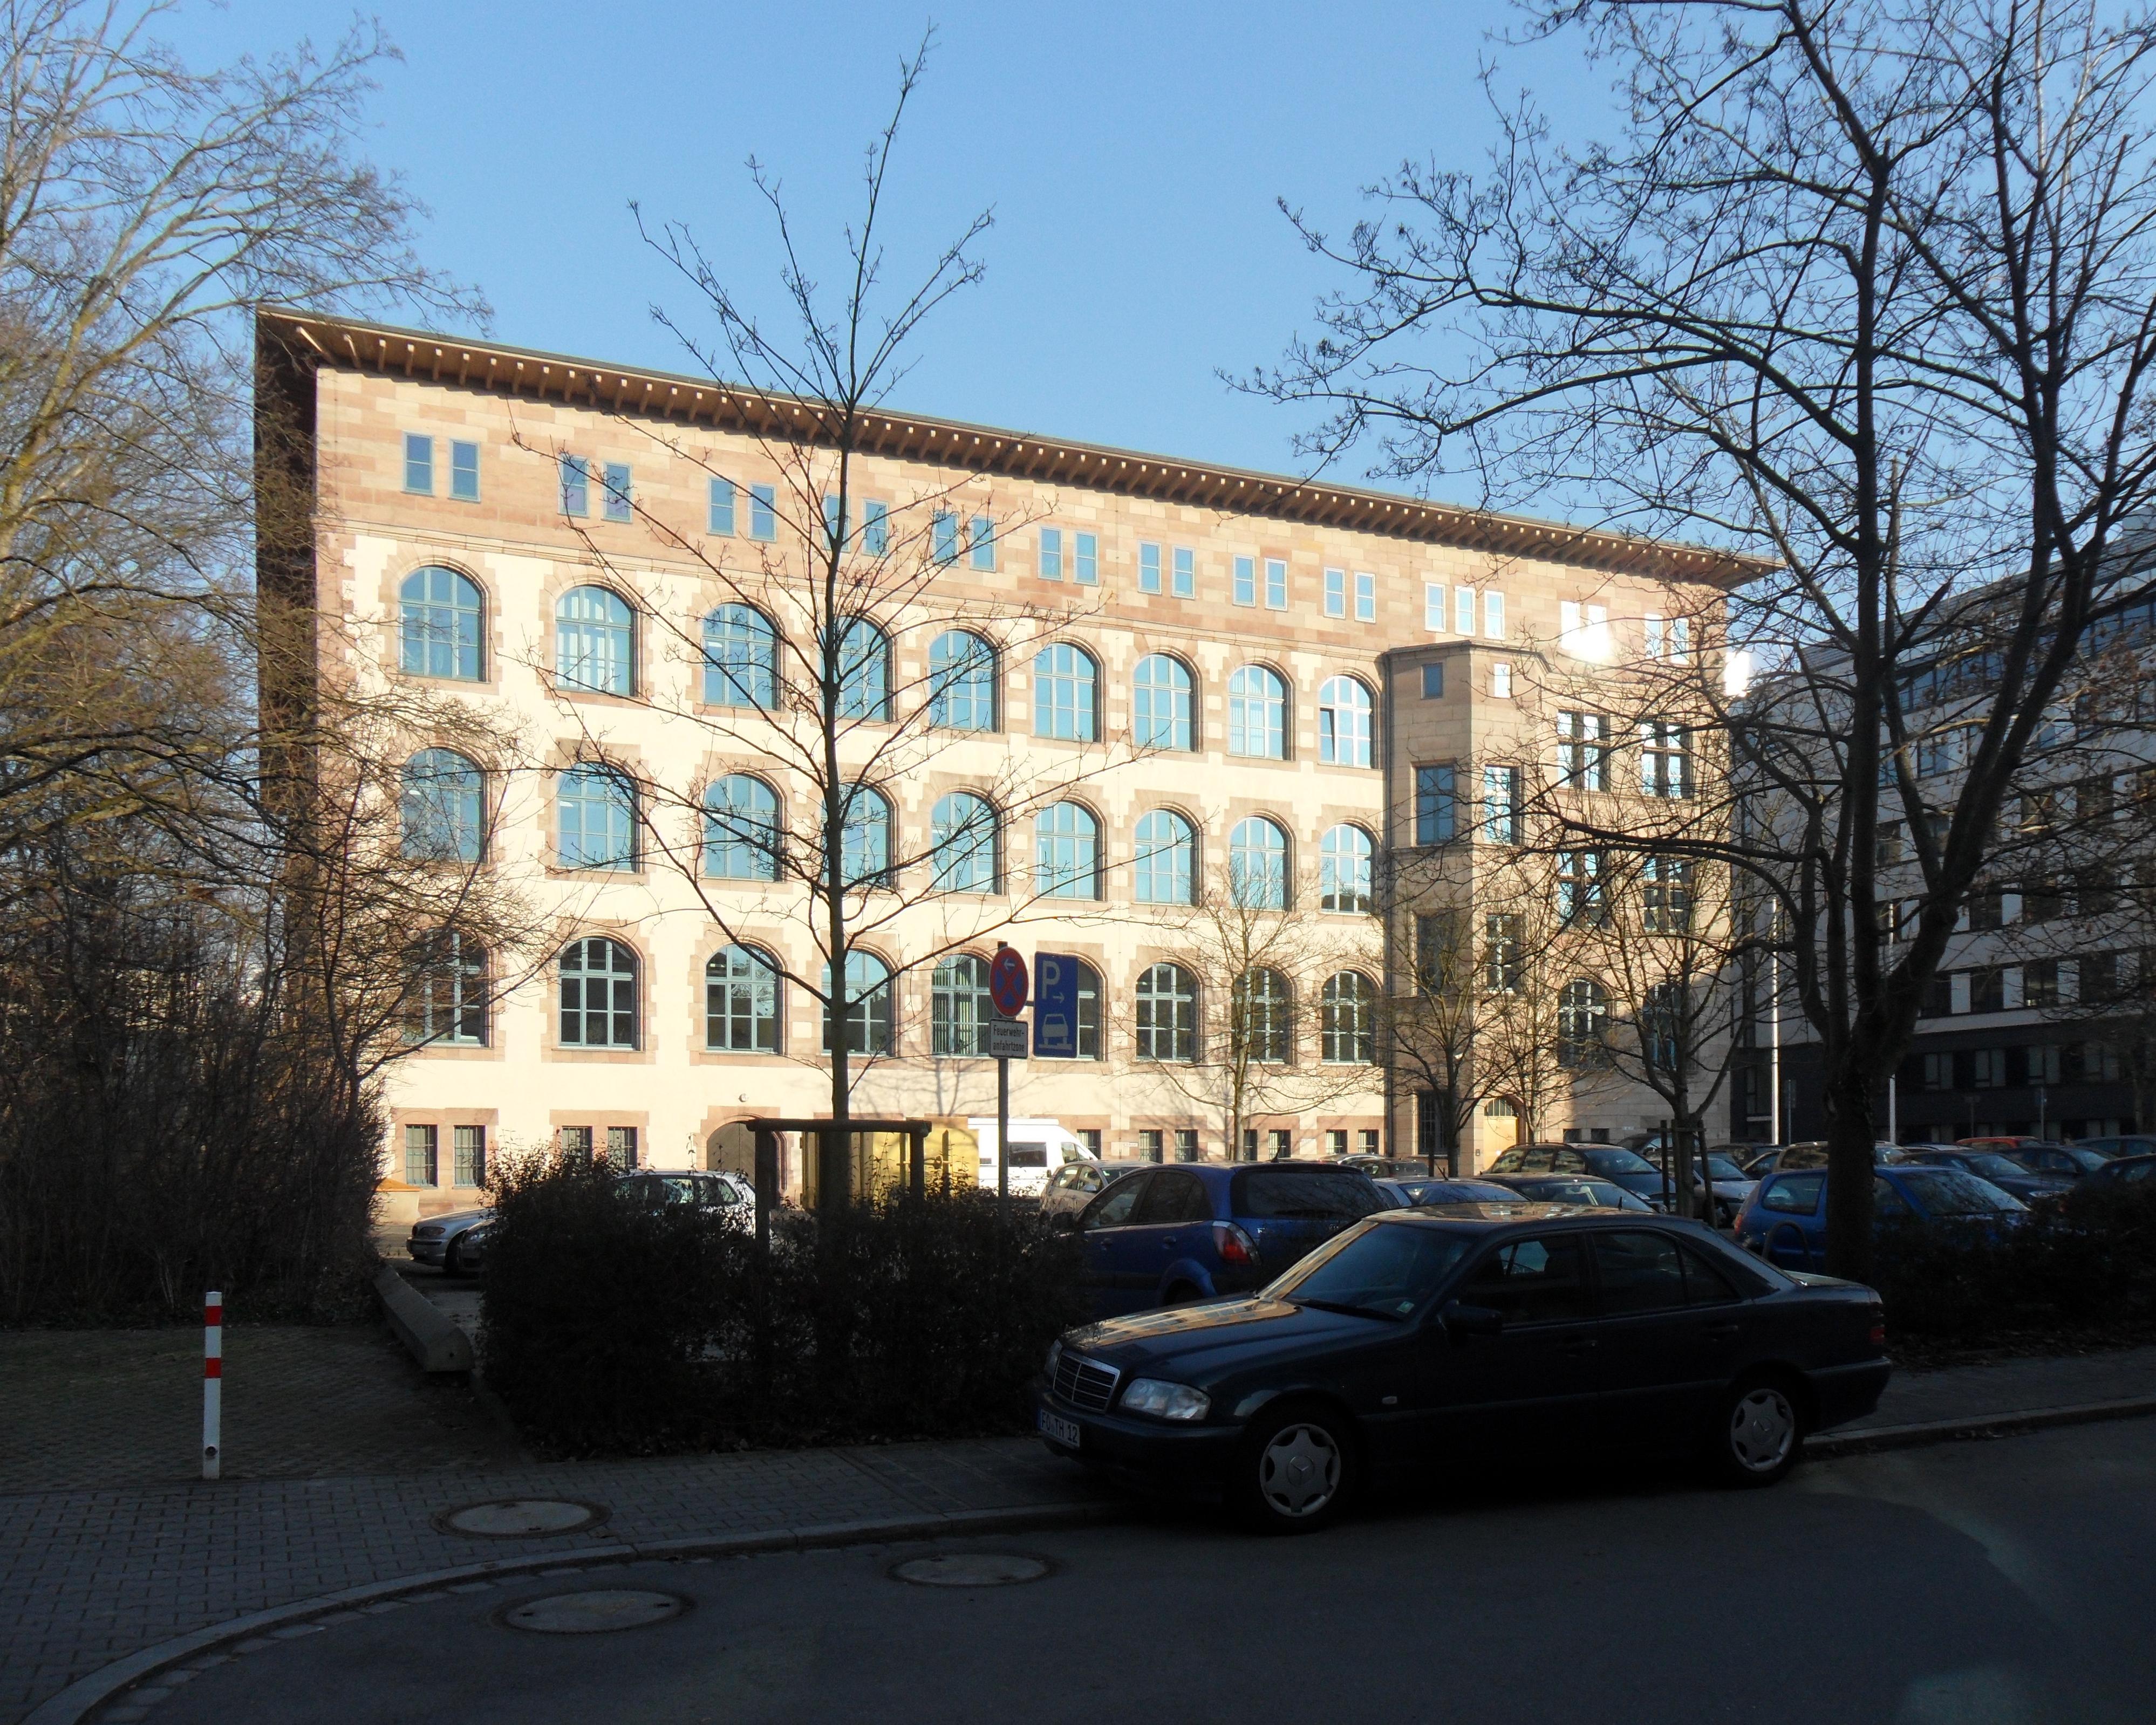 Amtsgericht Nürnberg Flaschenhofstr file amtsgericht nürnberg flaschenhofstraße 35 marienvorstadt 01 jpg